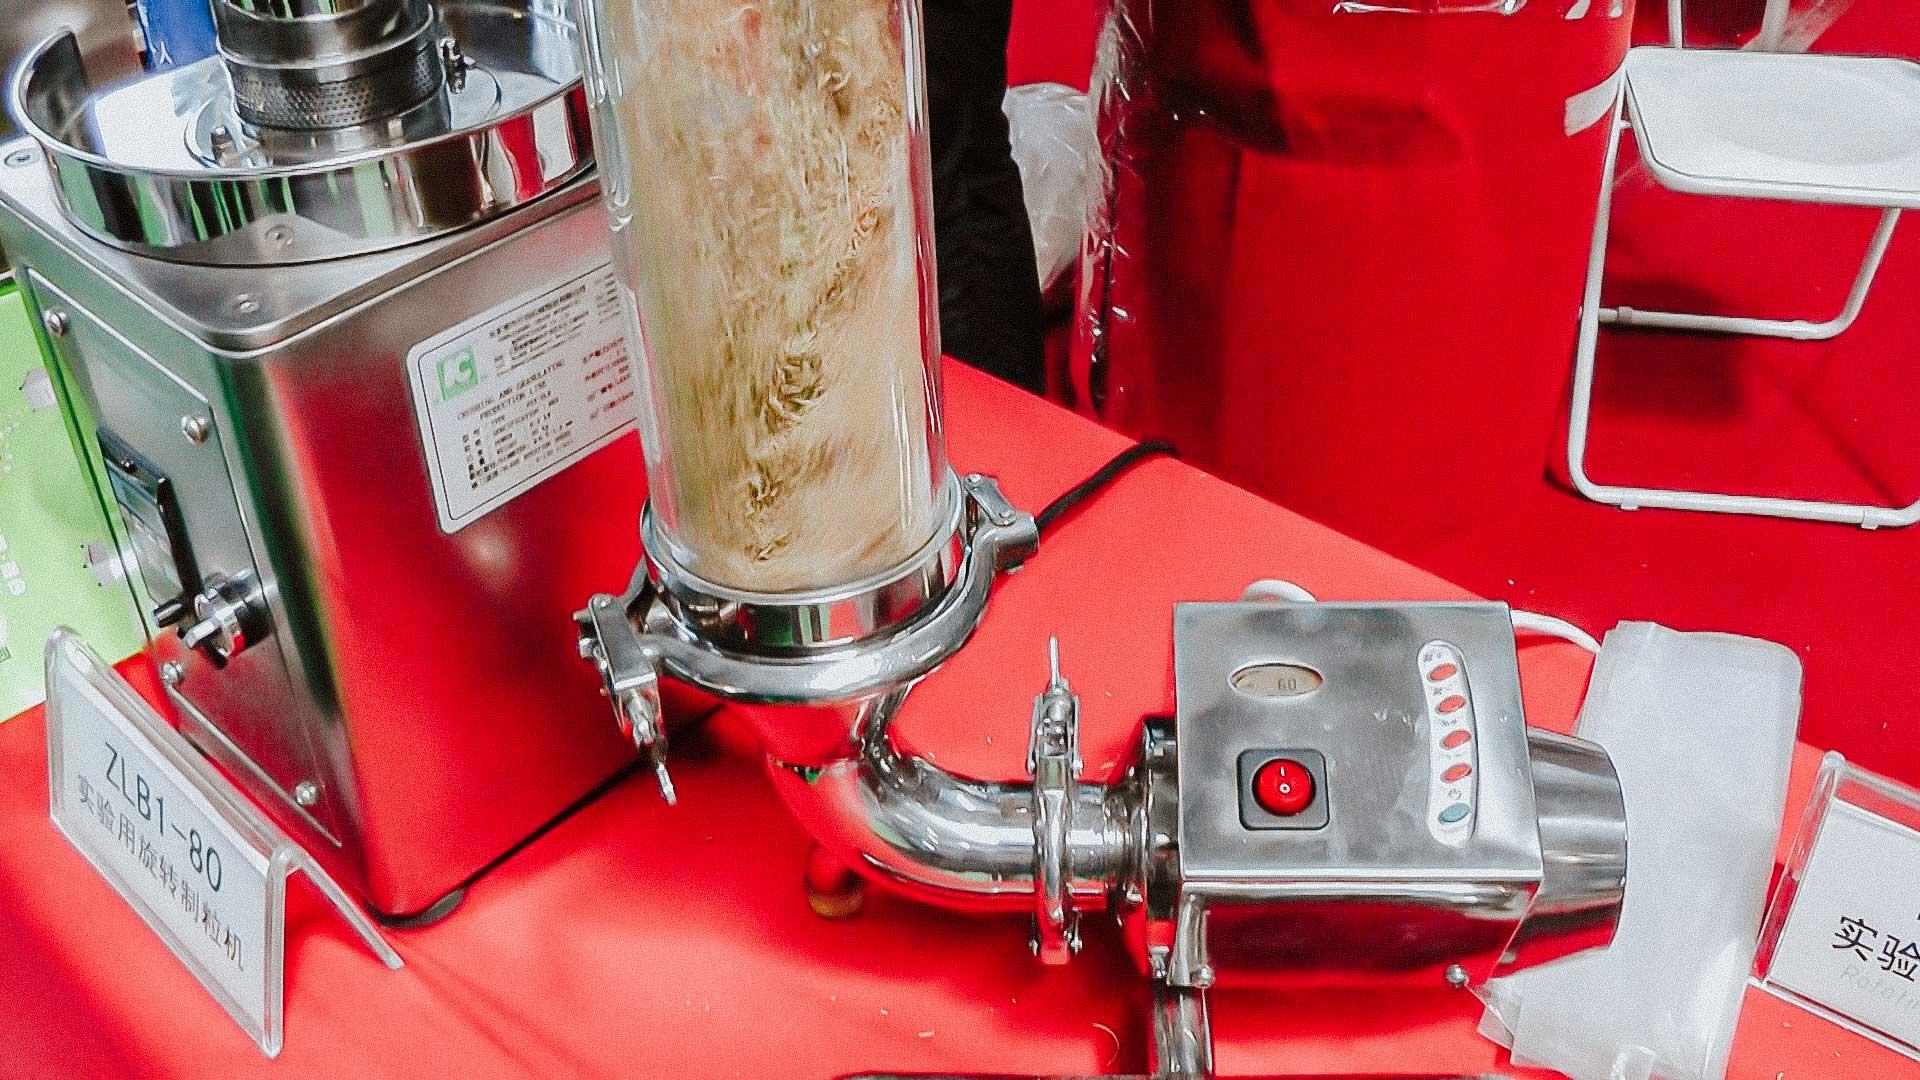 Vertical fluidized bed granulator for laboratory granule production